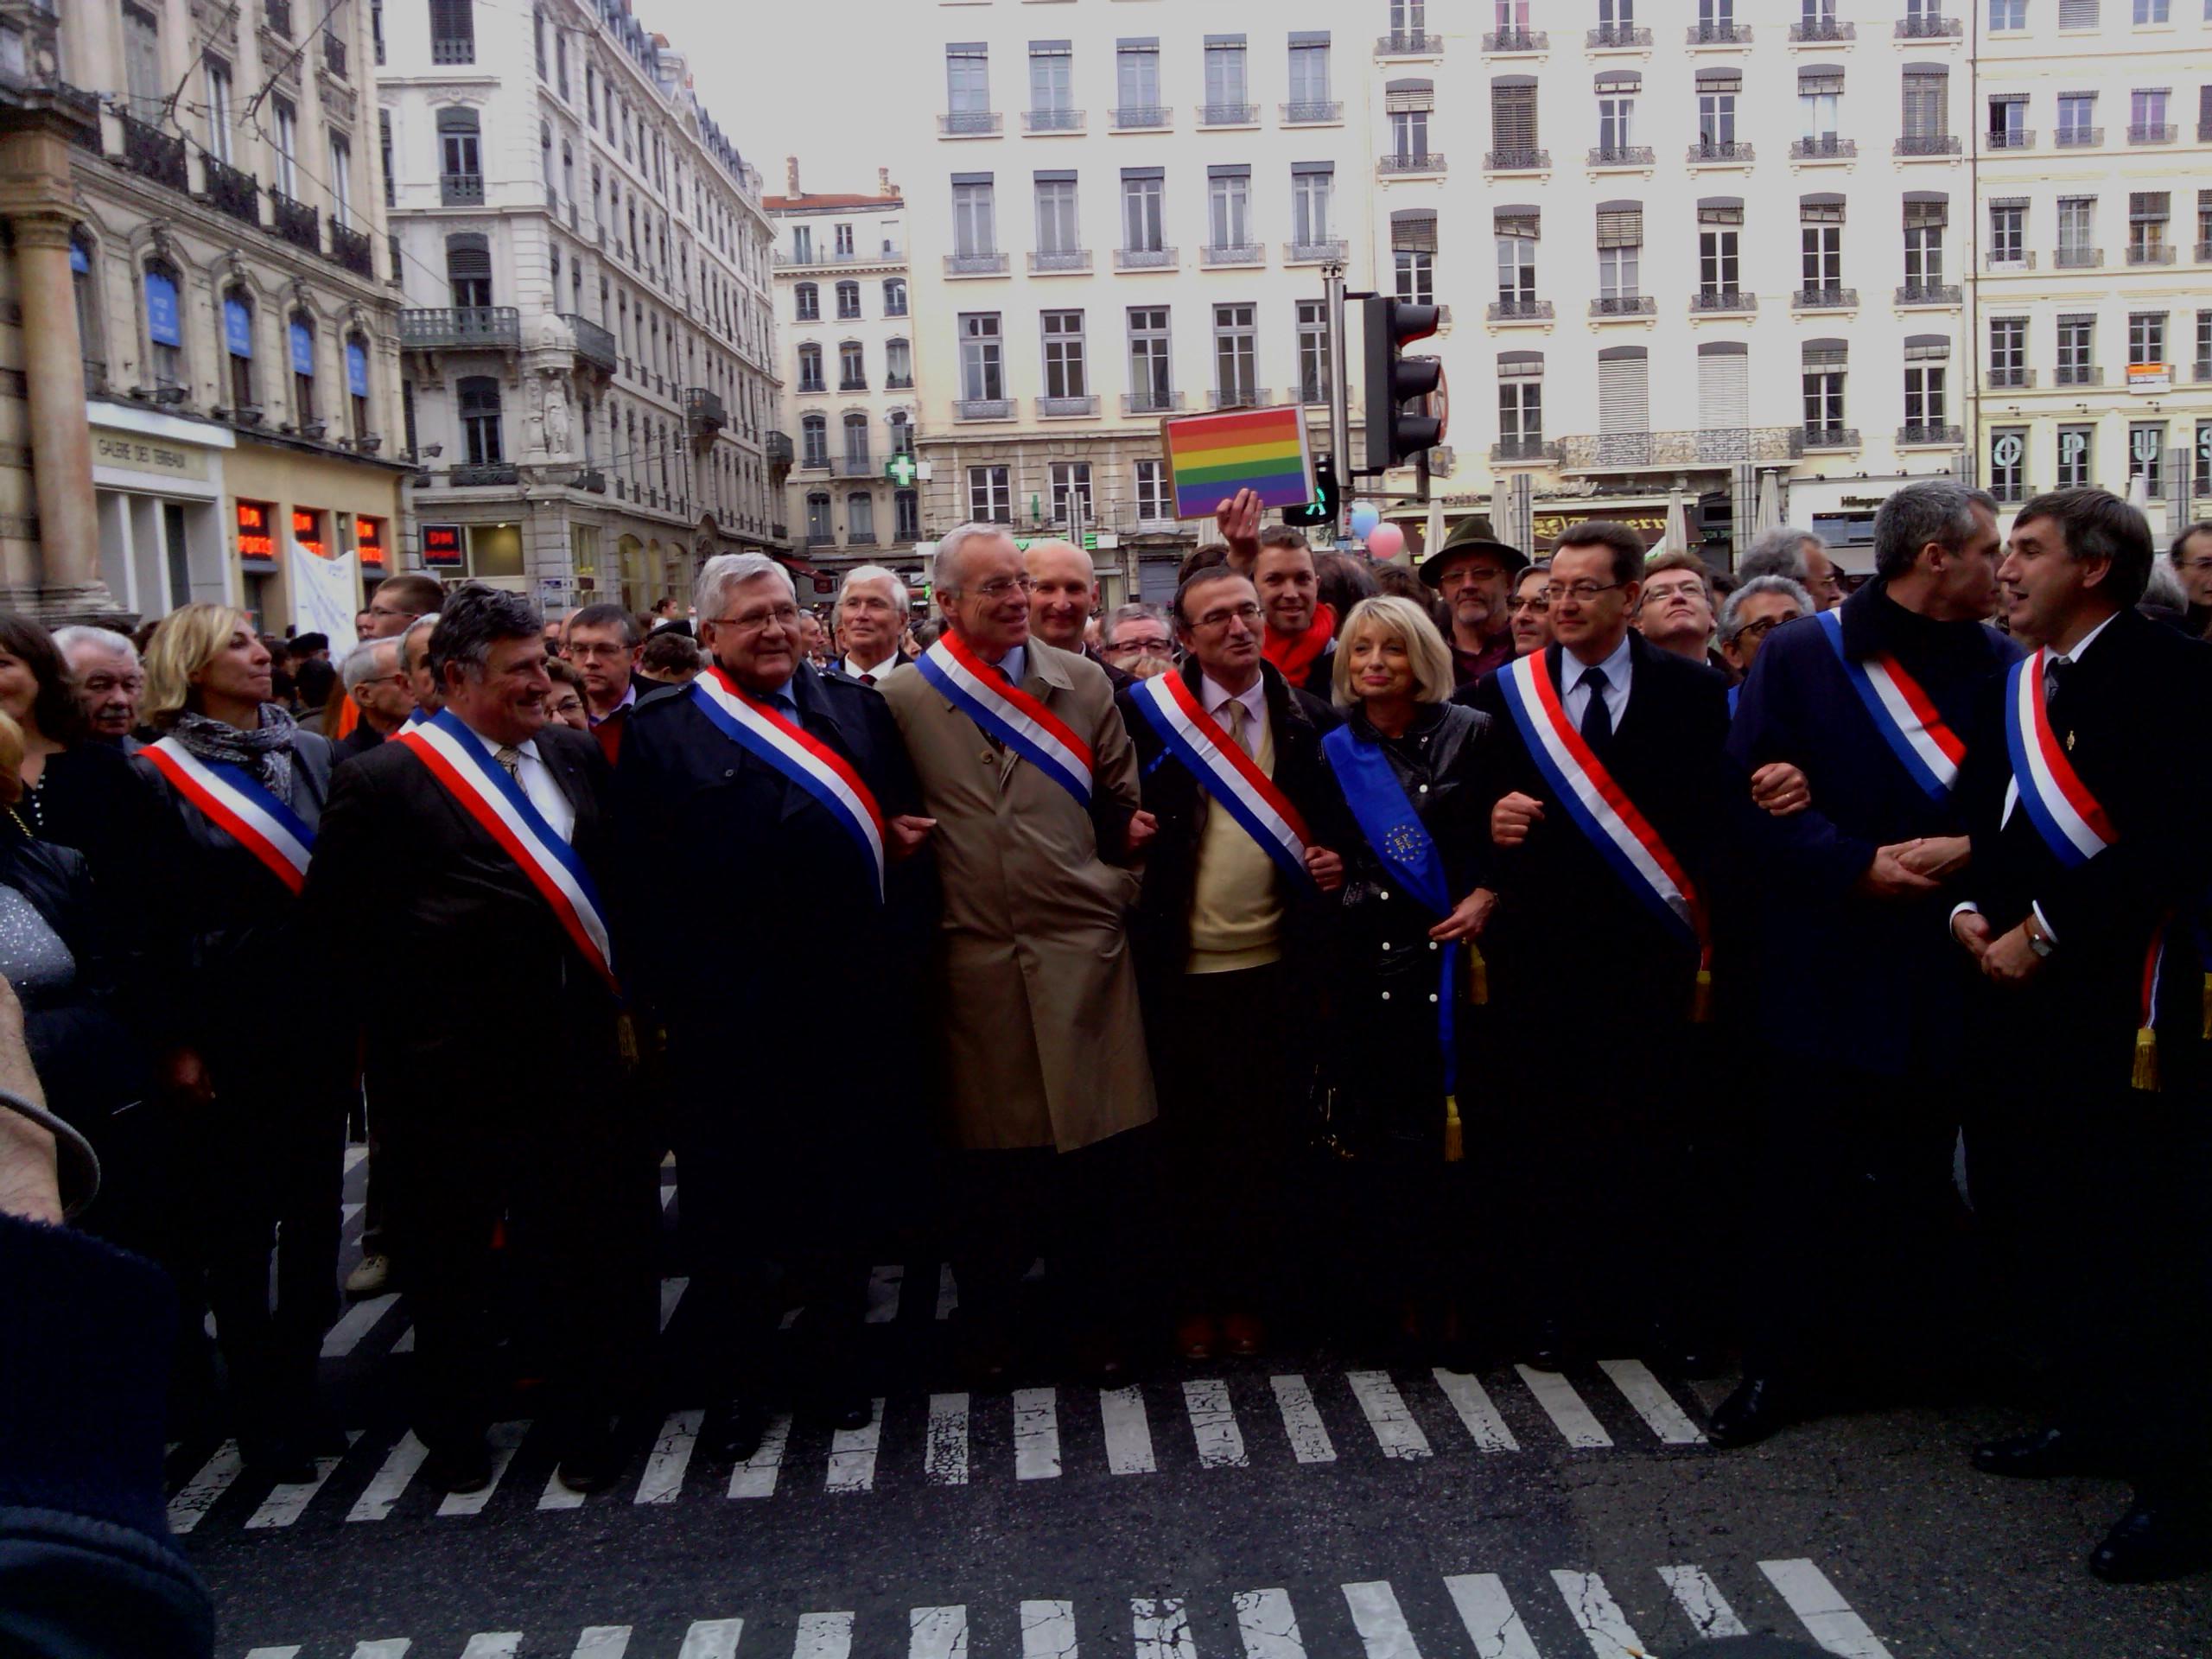 manifestation à Lyon cet après-midi